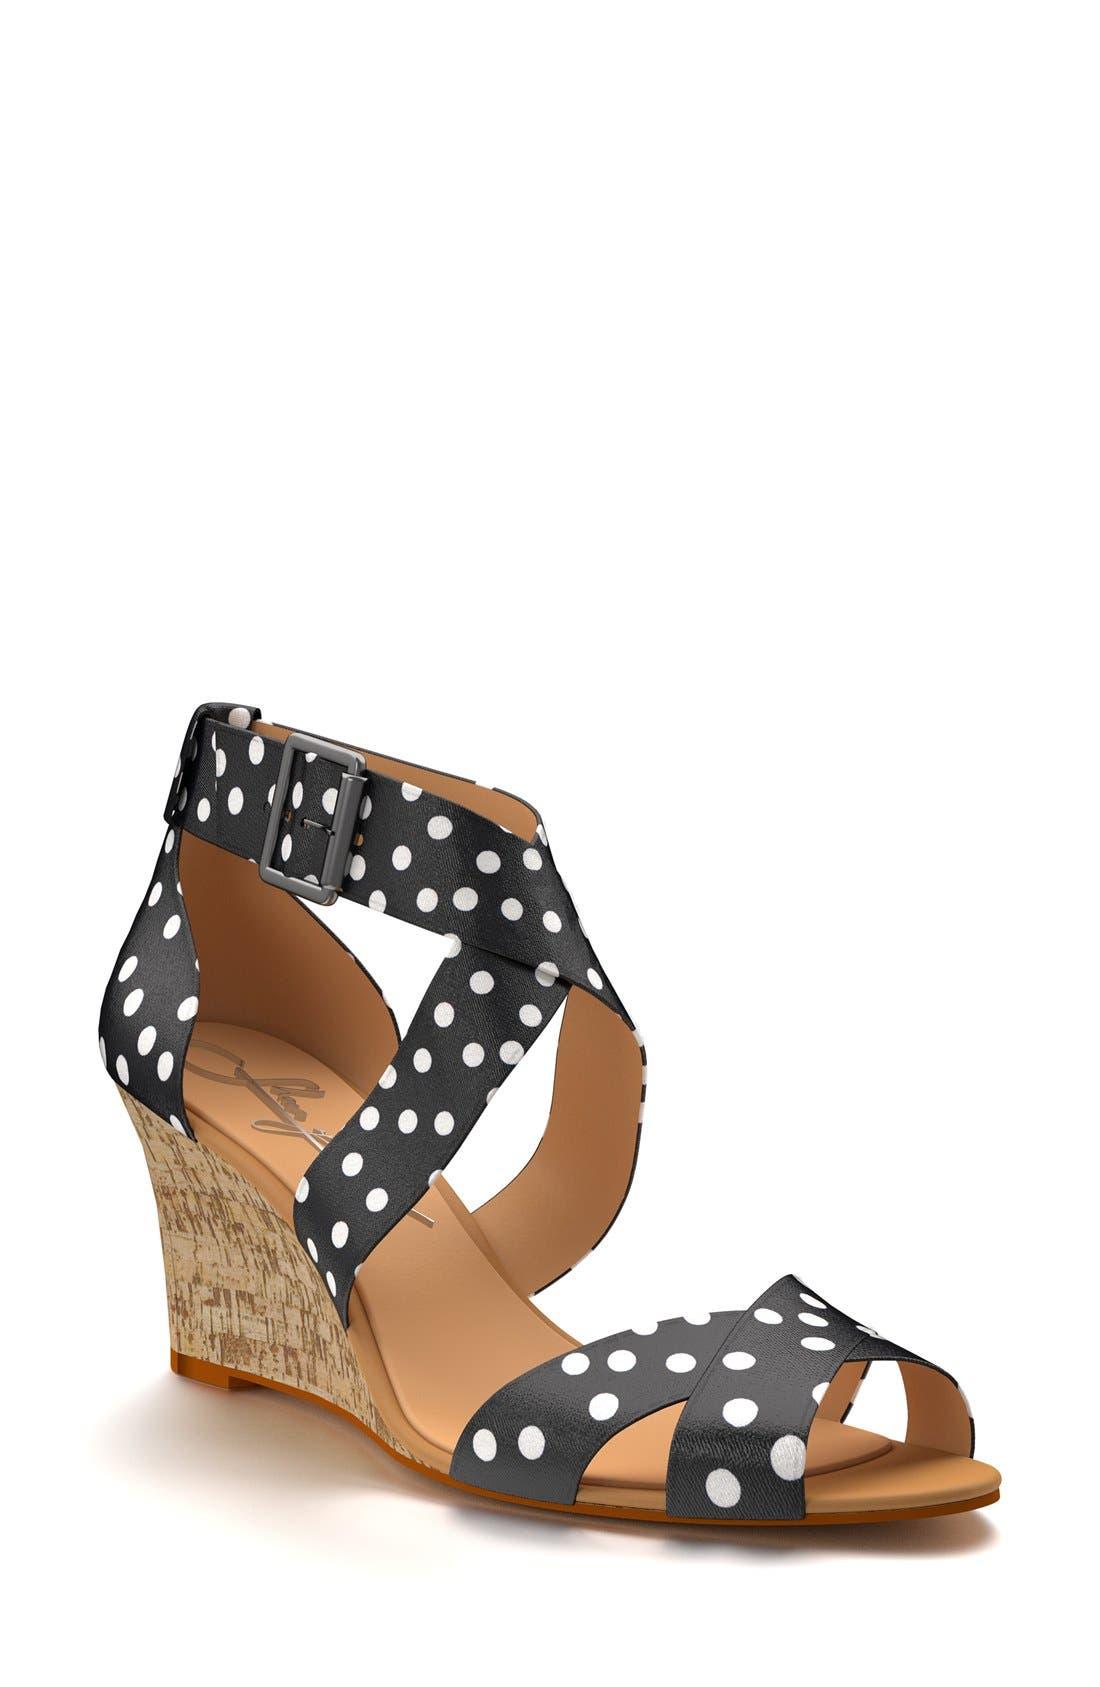 Alternate Image 1 Selected - Shoes of Prey Crisscross Strap Wedge Sandal (Women)